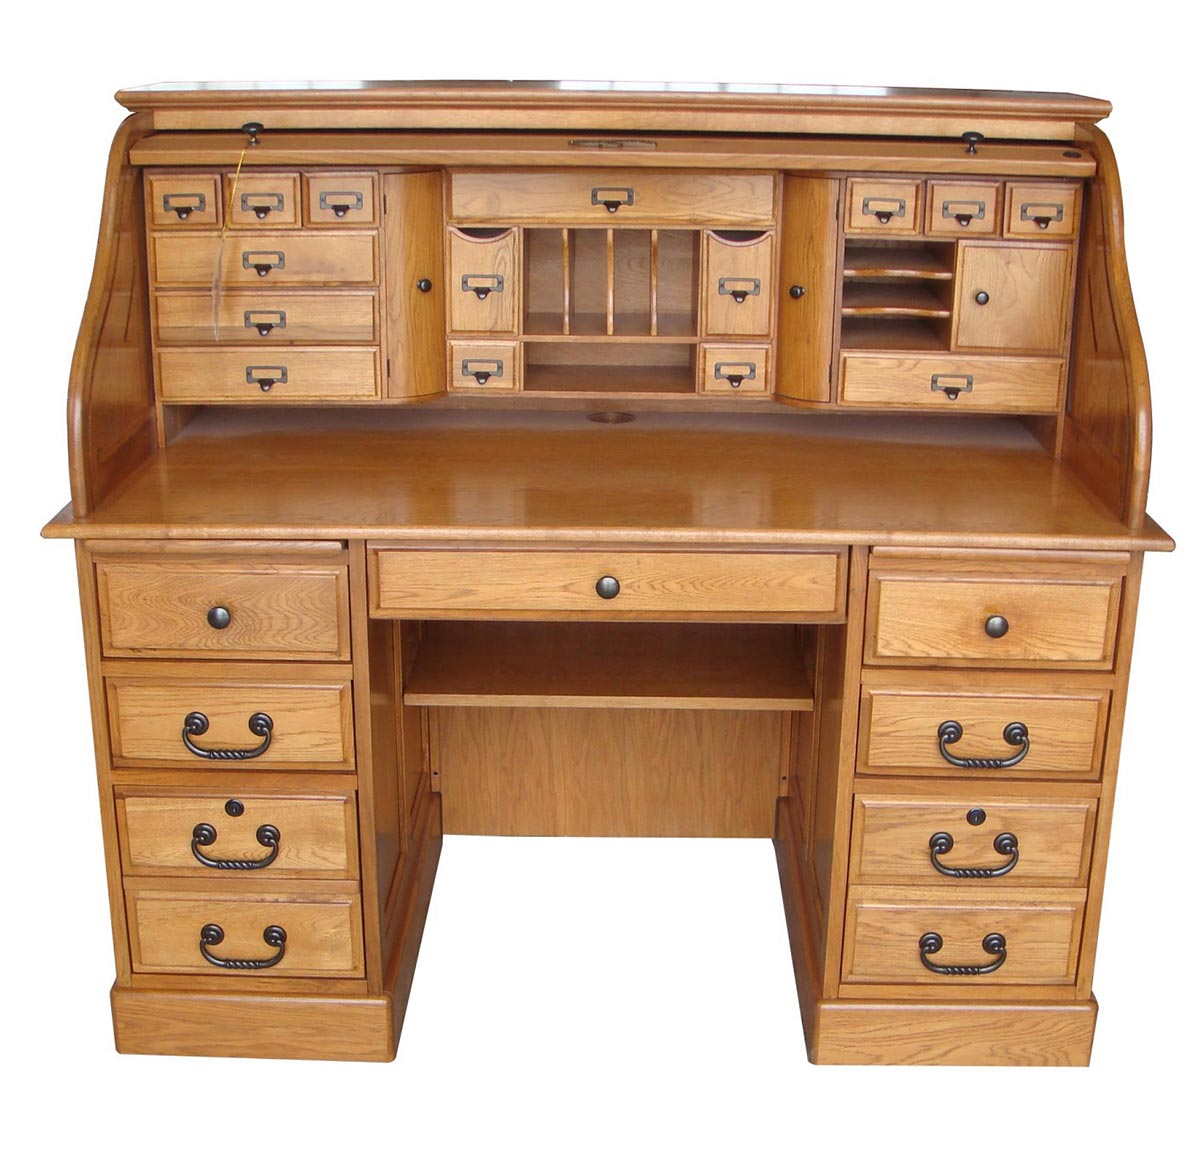 Chelsea Home Marlin 54-inch Deluxe Roll Top Desk Top - Harvest Oak